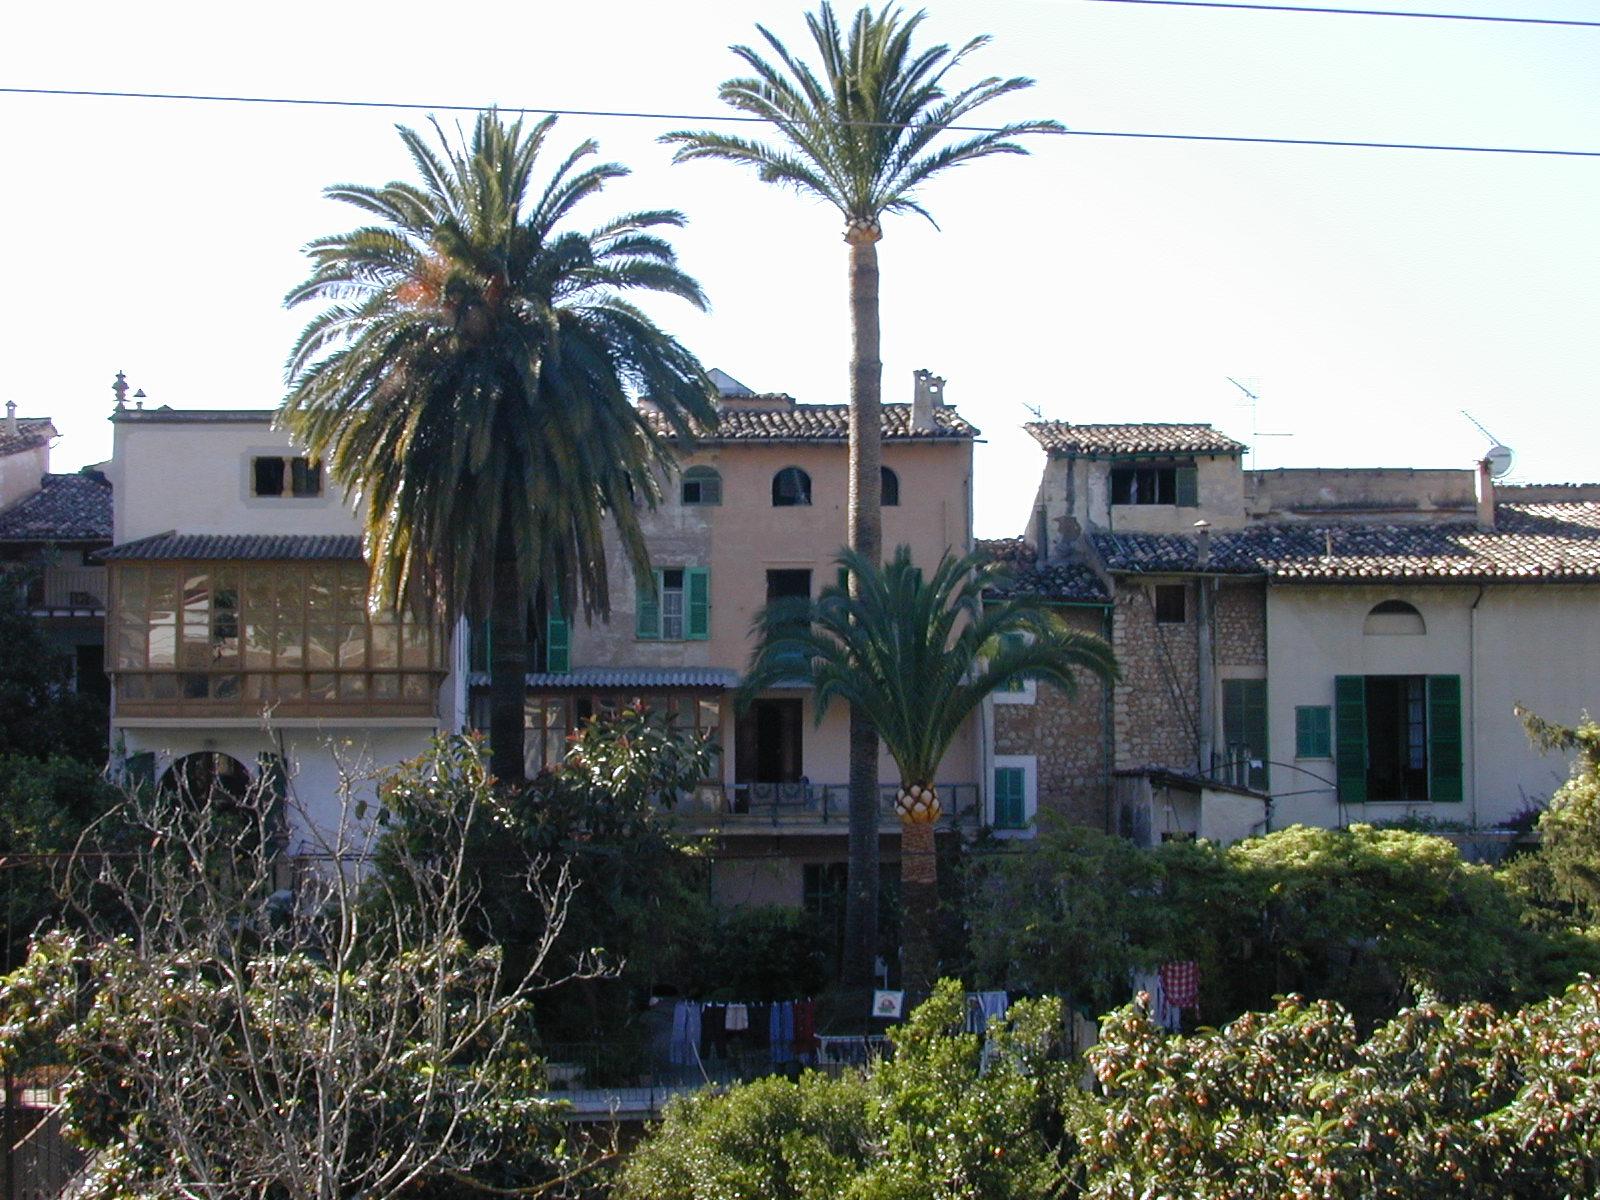 palm palmtree palmtrees tropical spanish mexican village mediterrenean